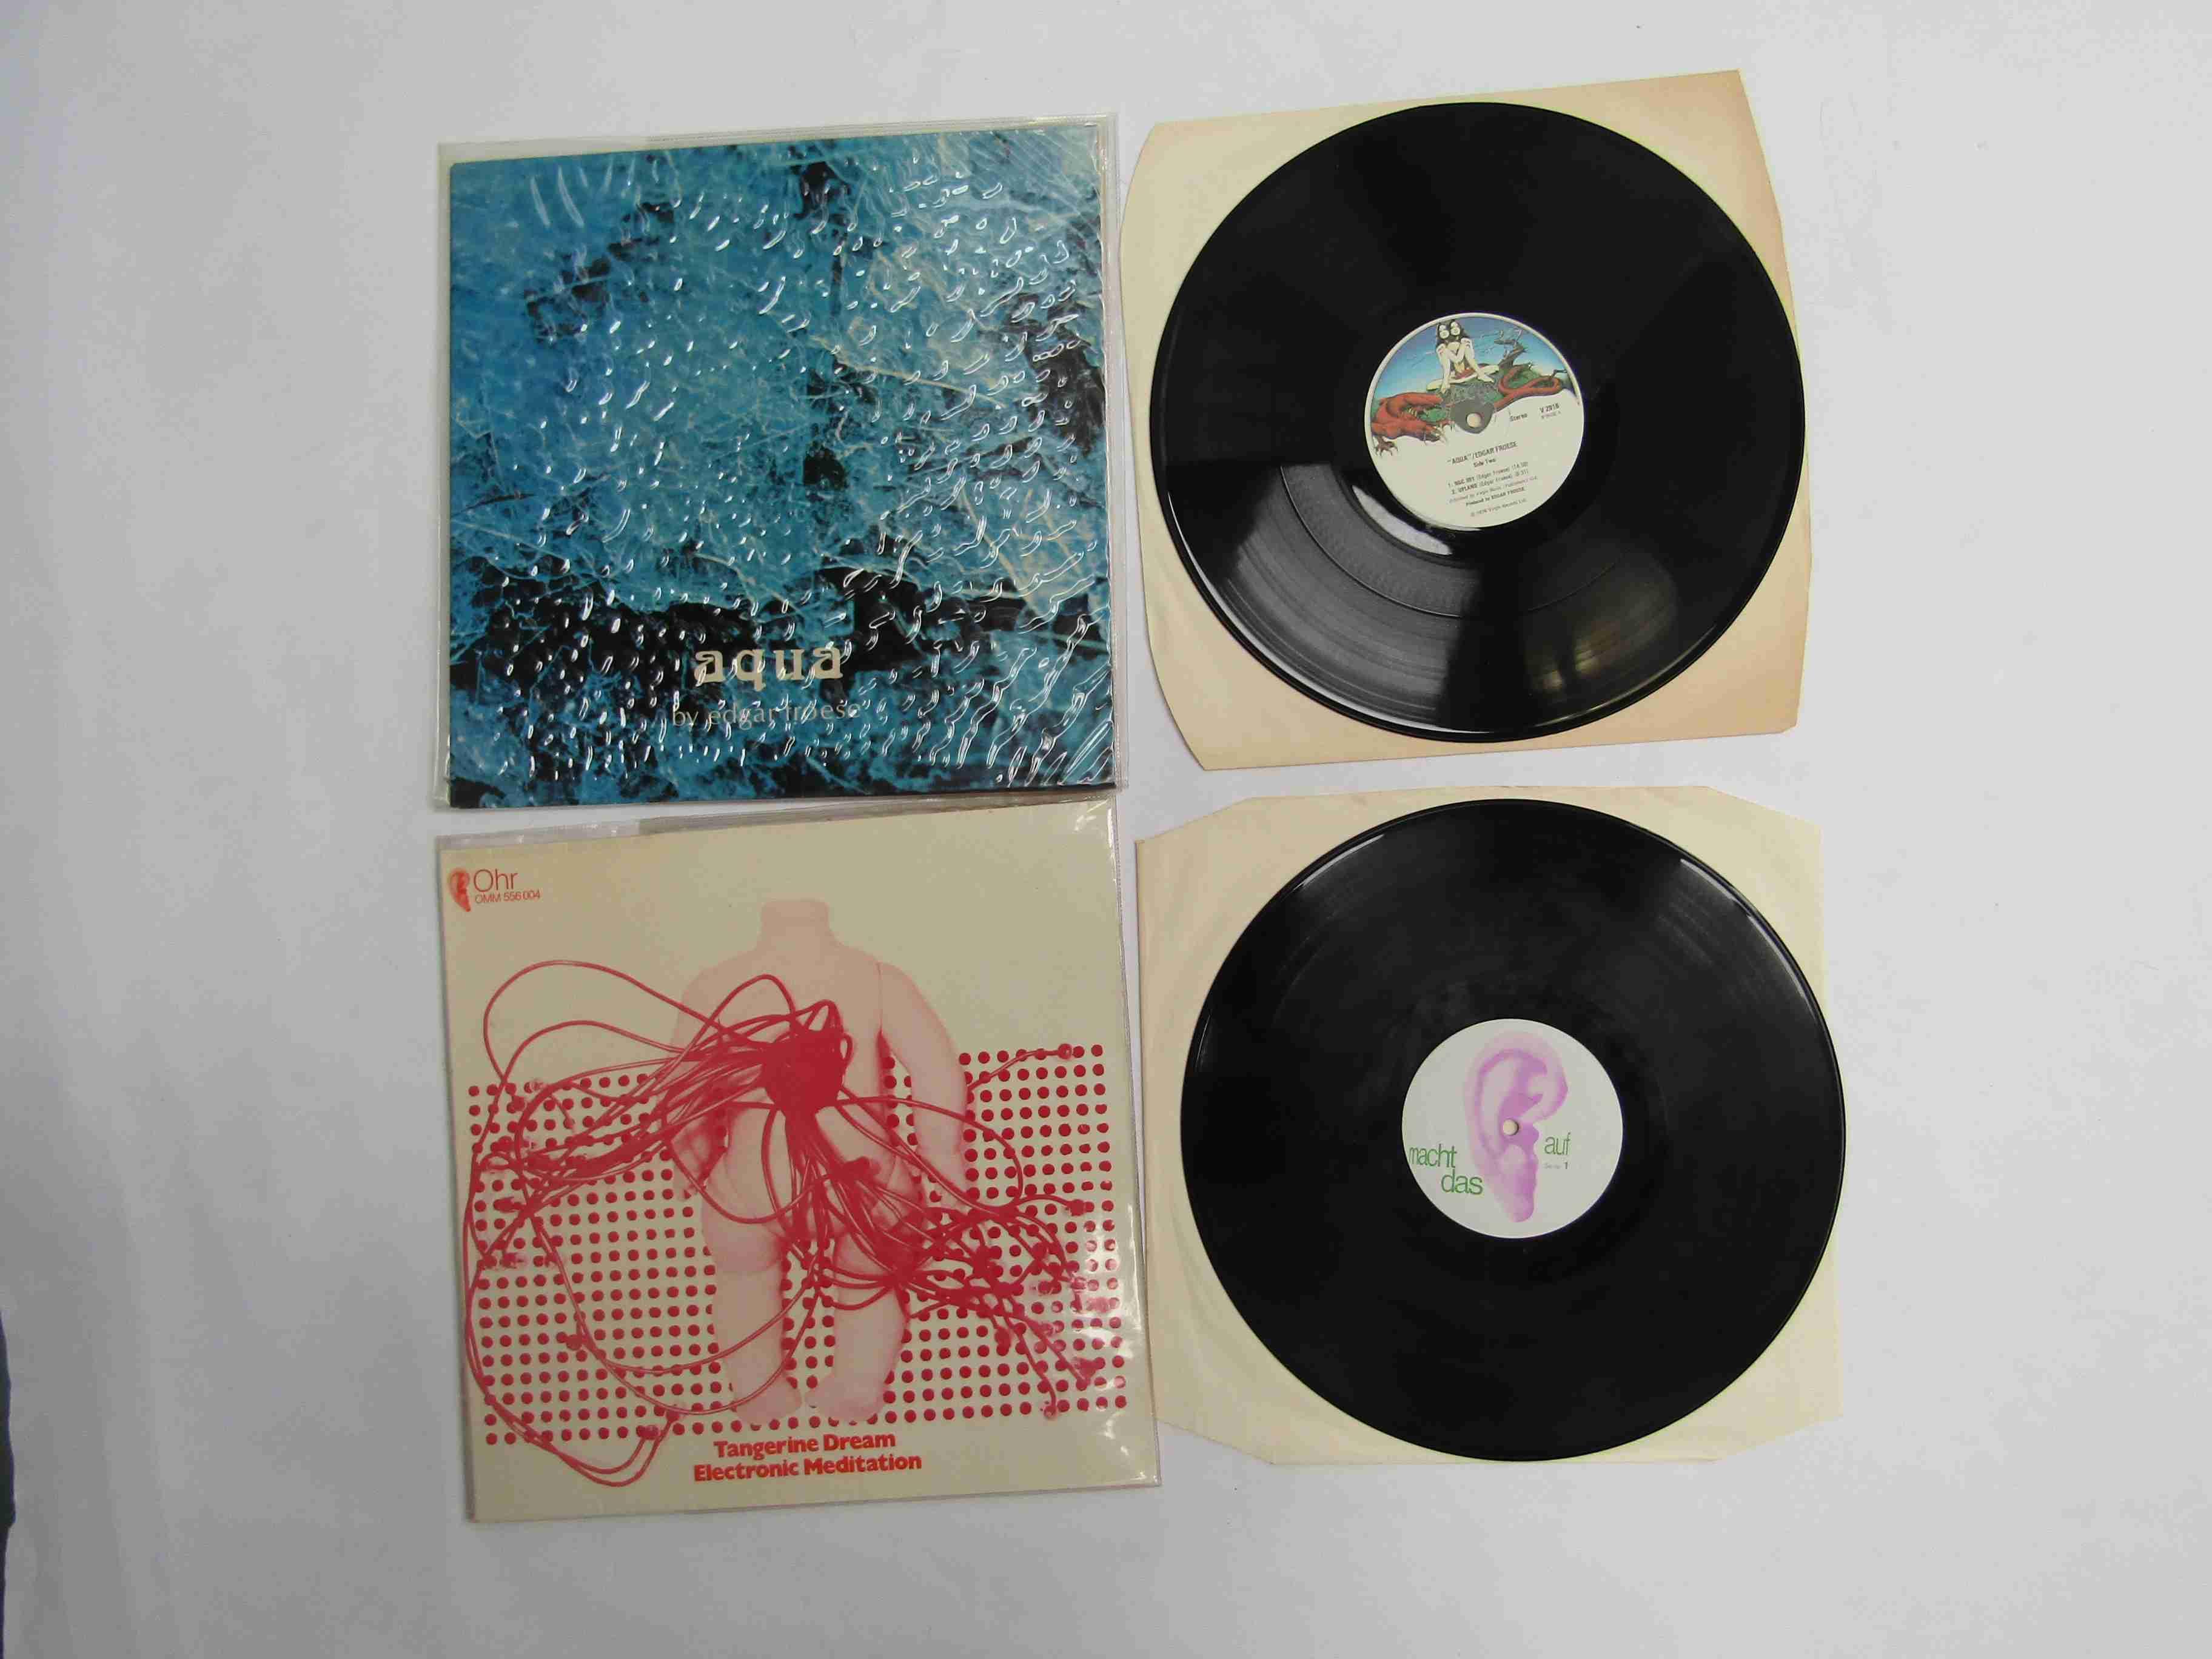 TANGERINE DREAM: 'Electronic Meditation' LP, German reissue,